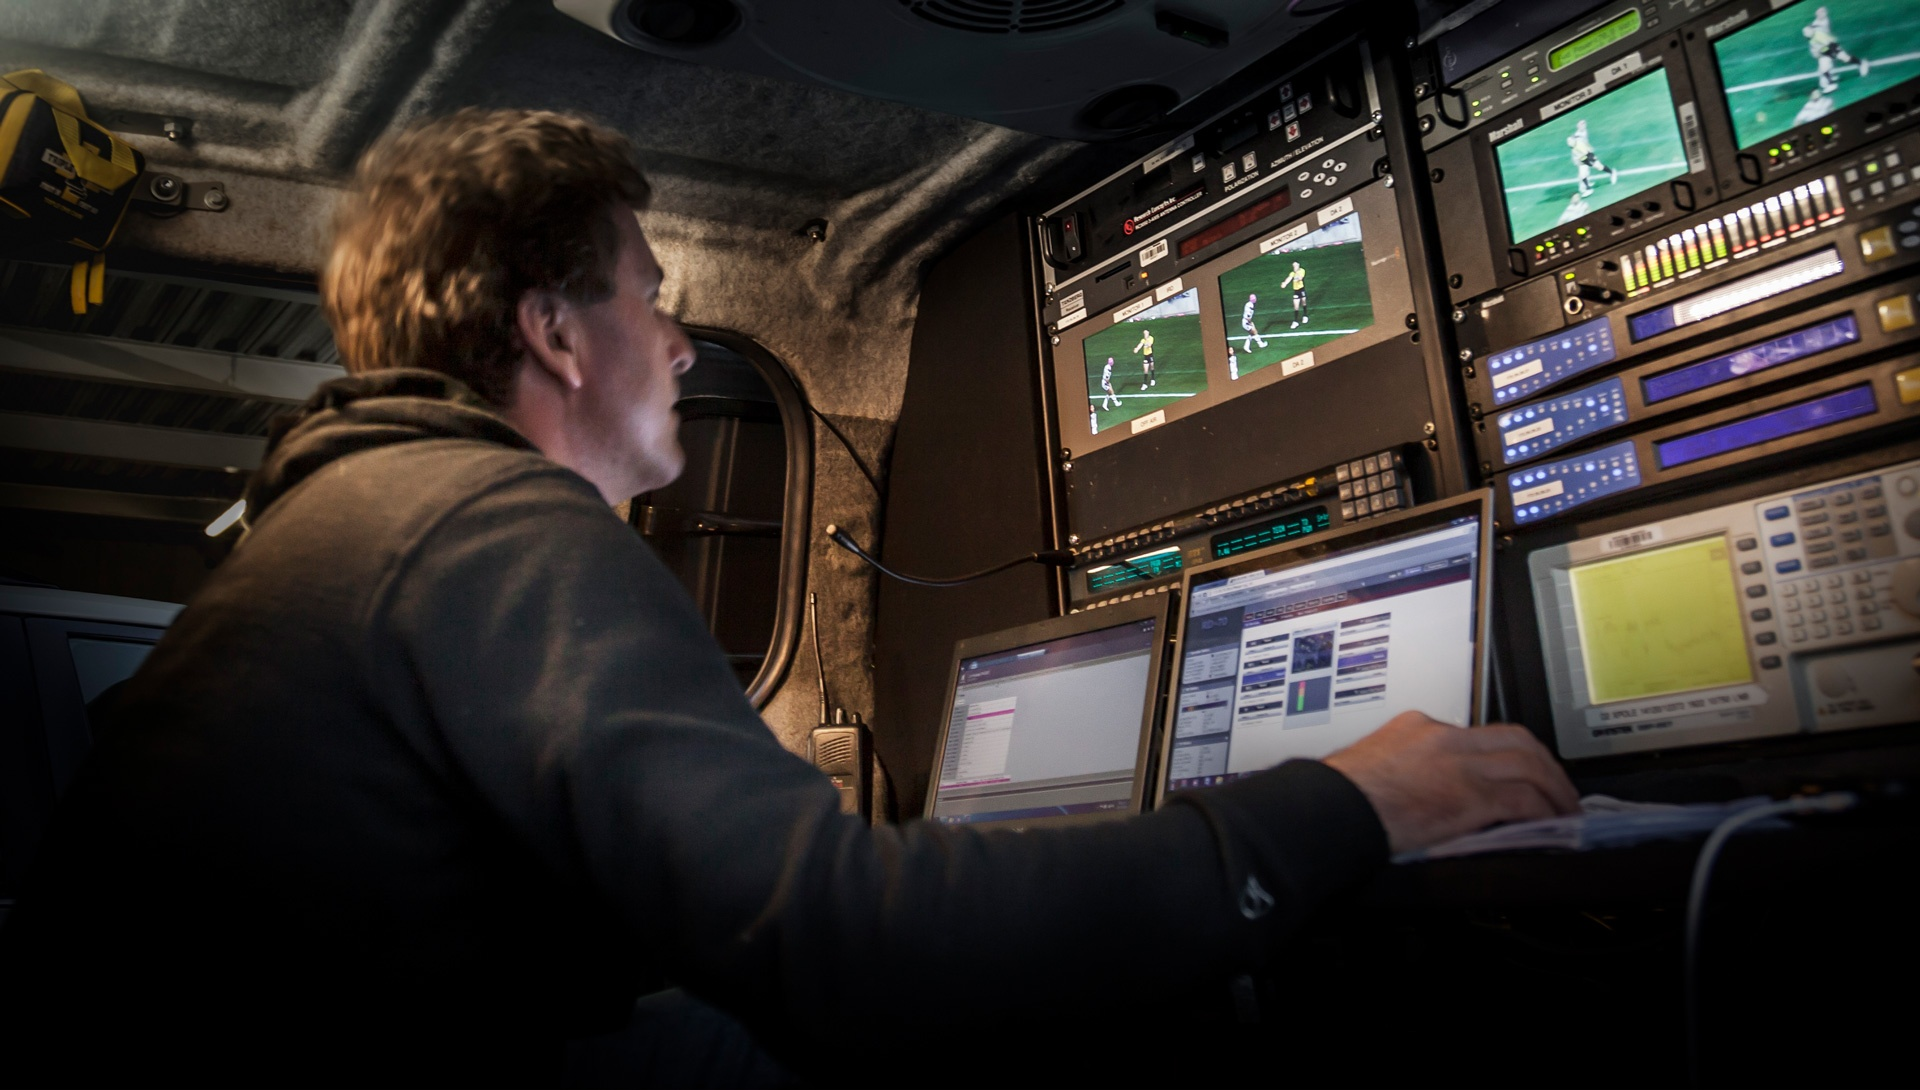 Network Provisioning Engineer